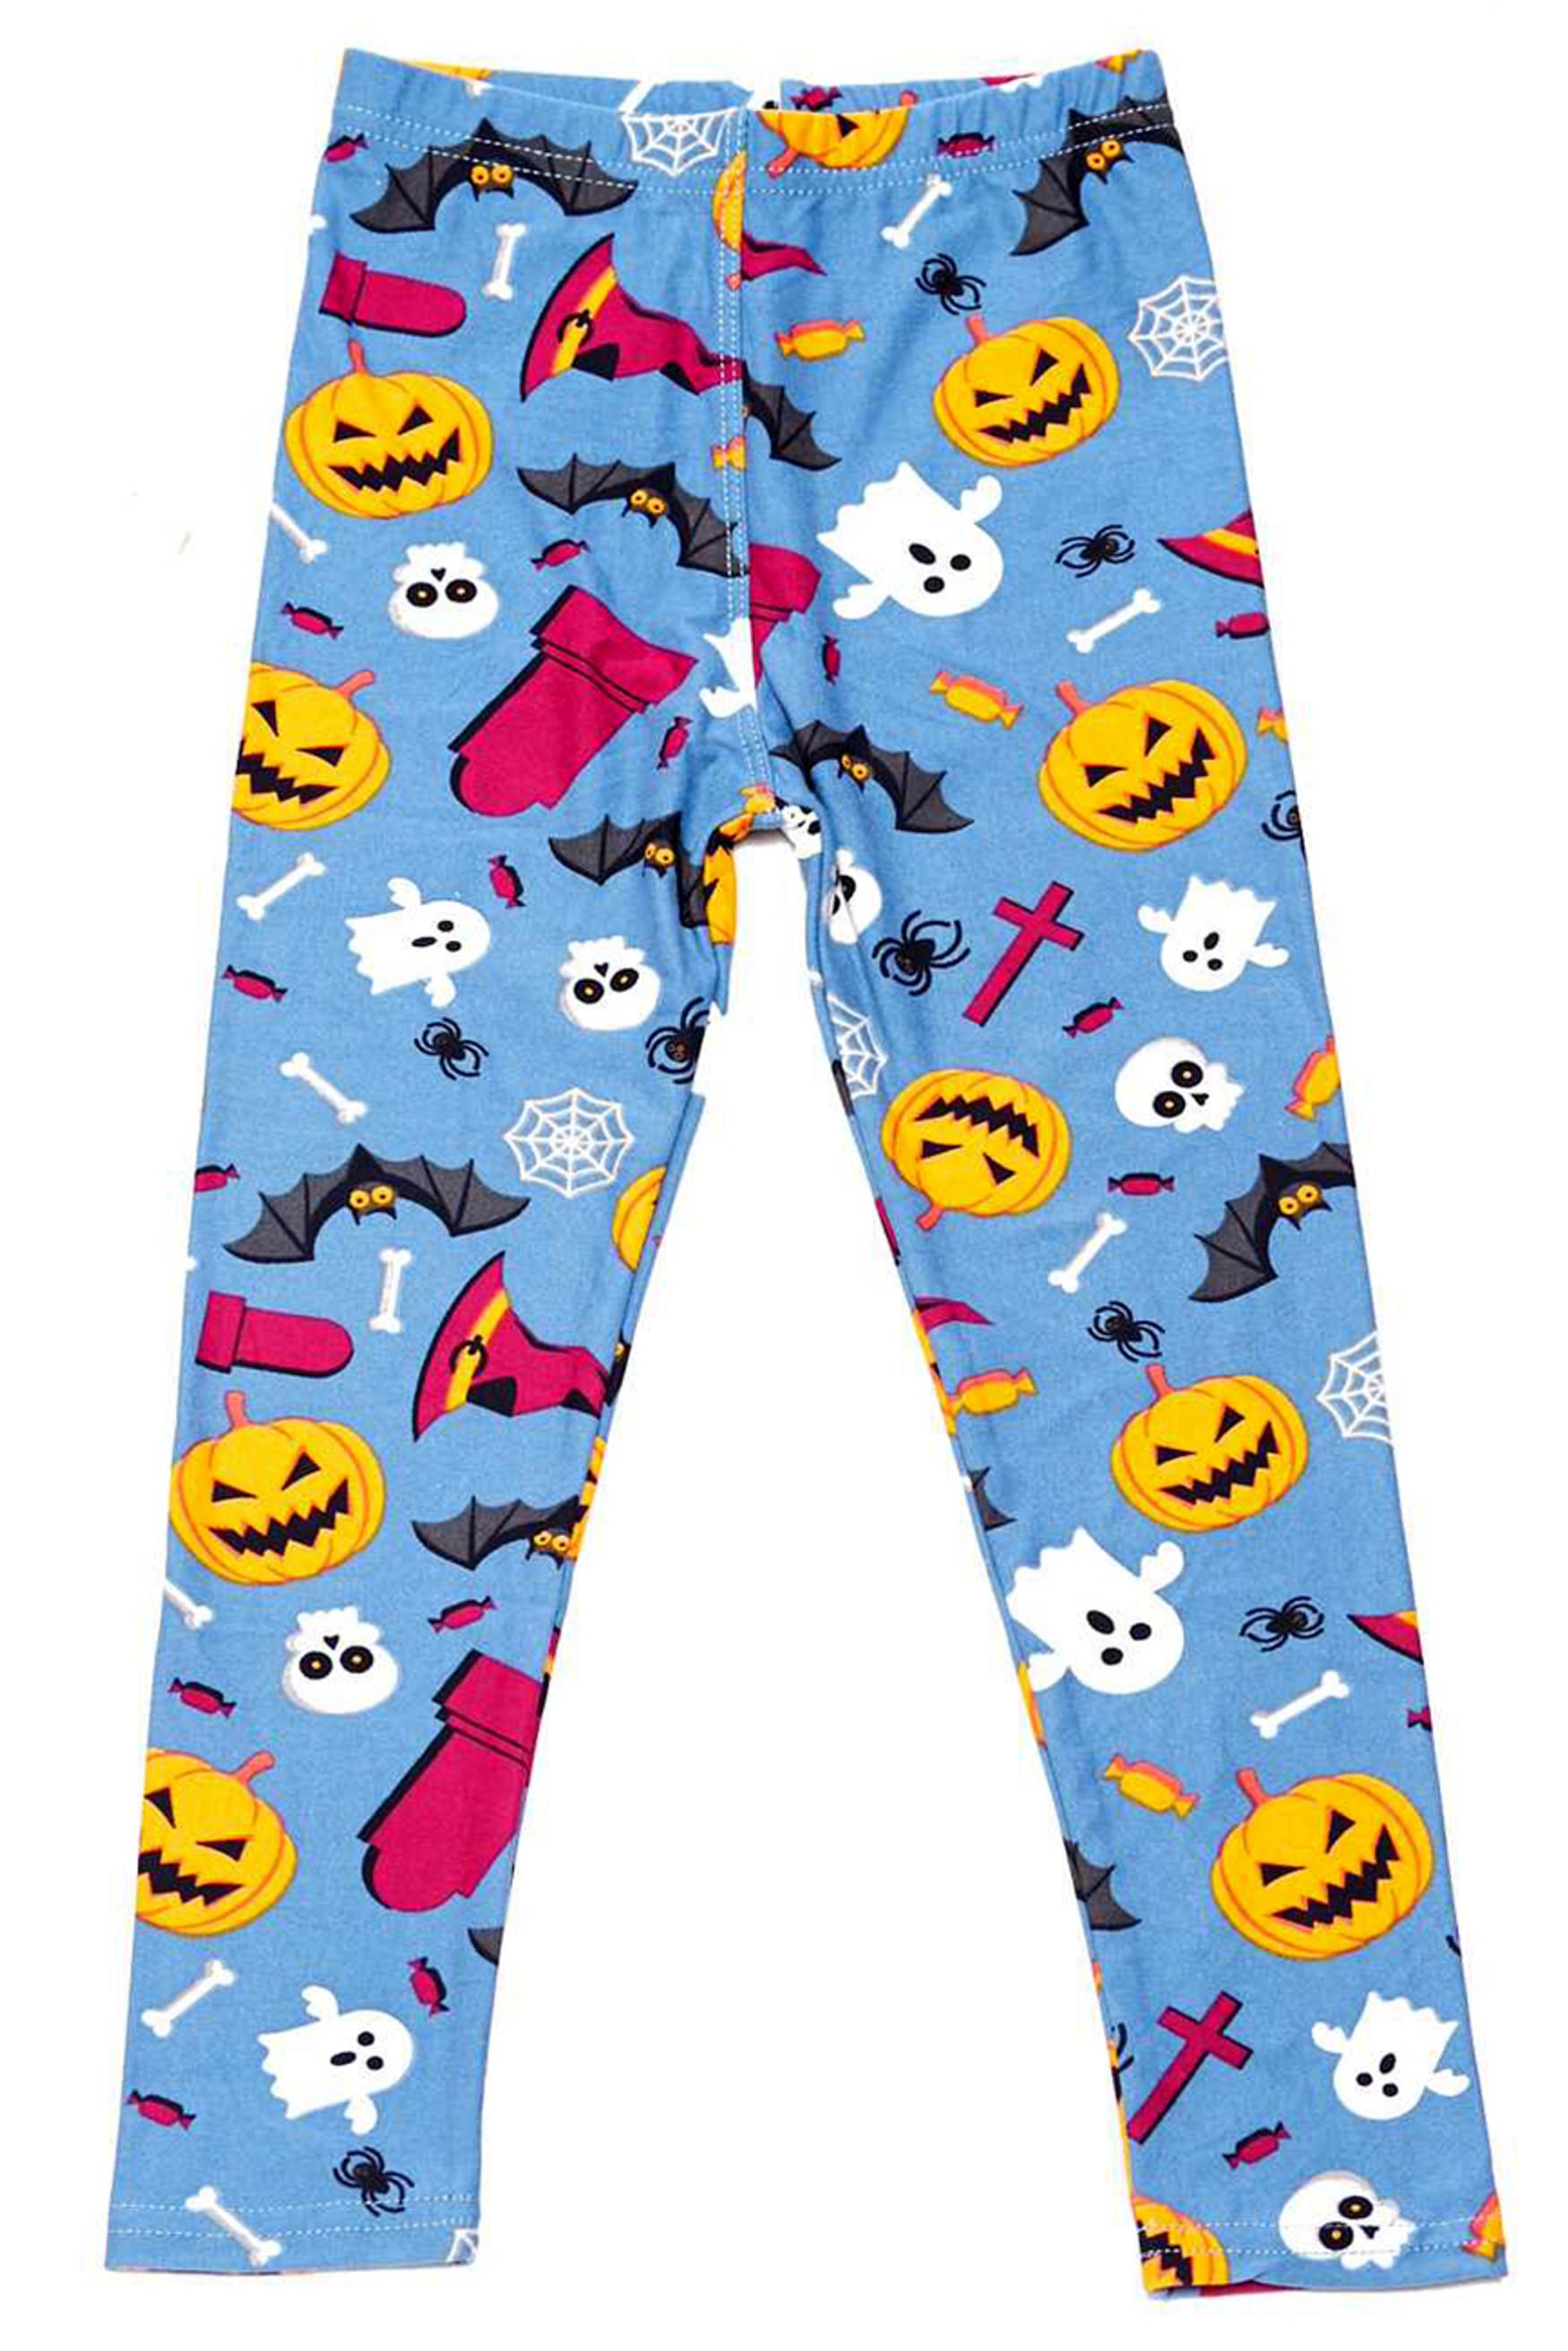 Soft Brushed Steel Blue Halloween Motif Kids Leggings